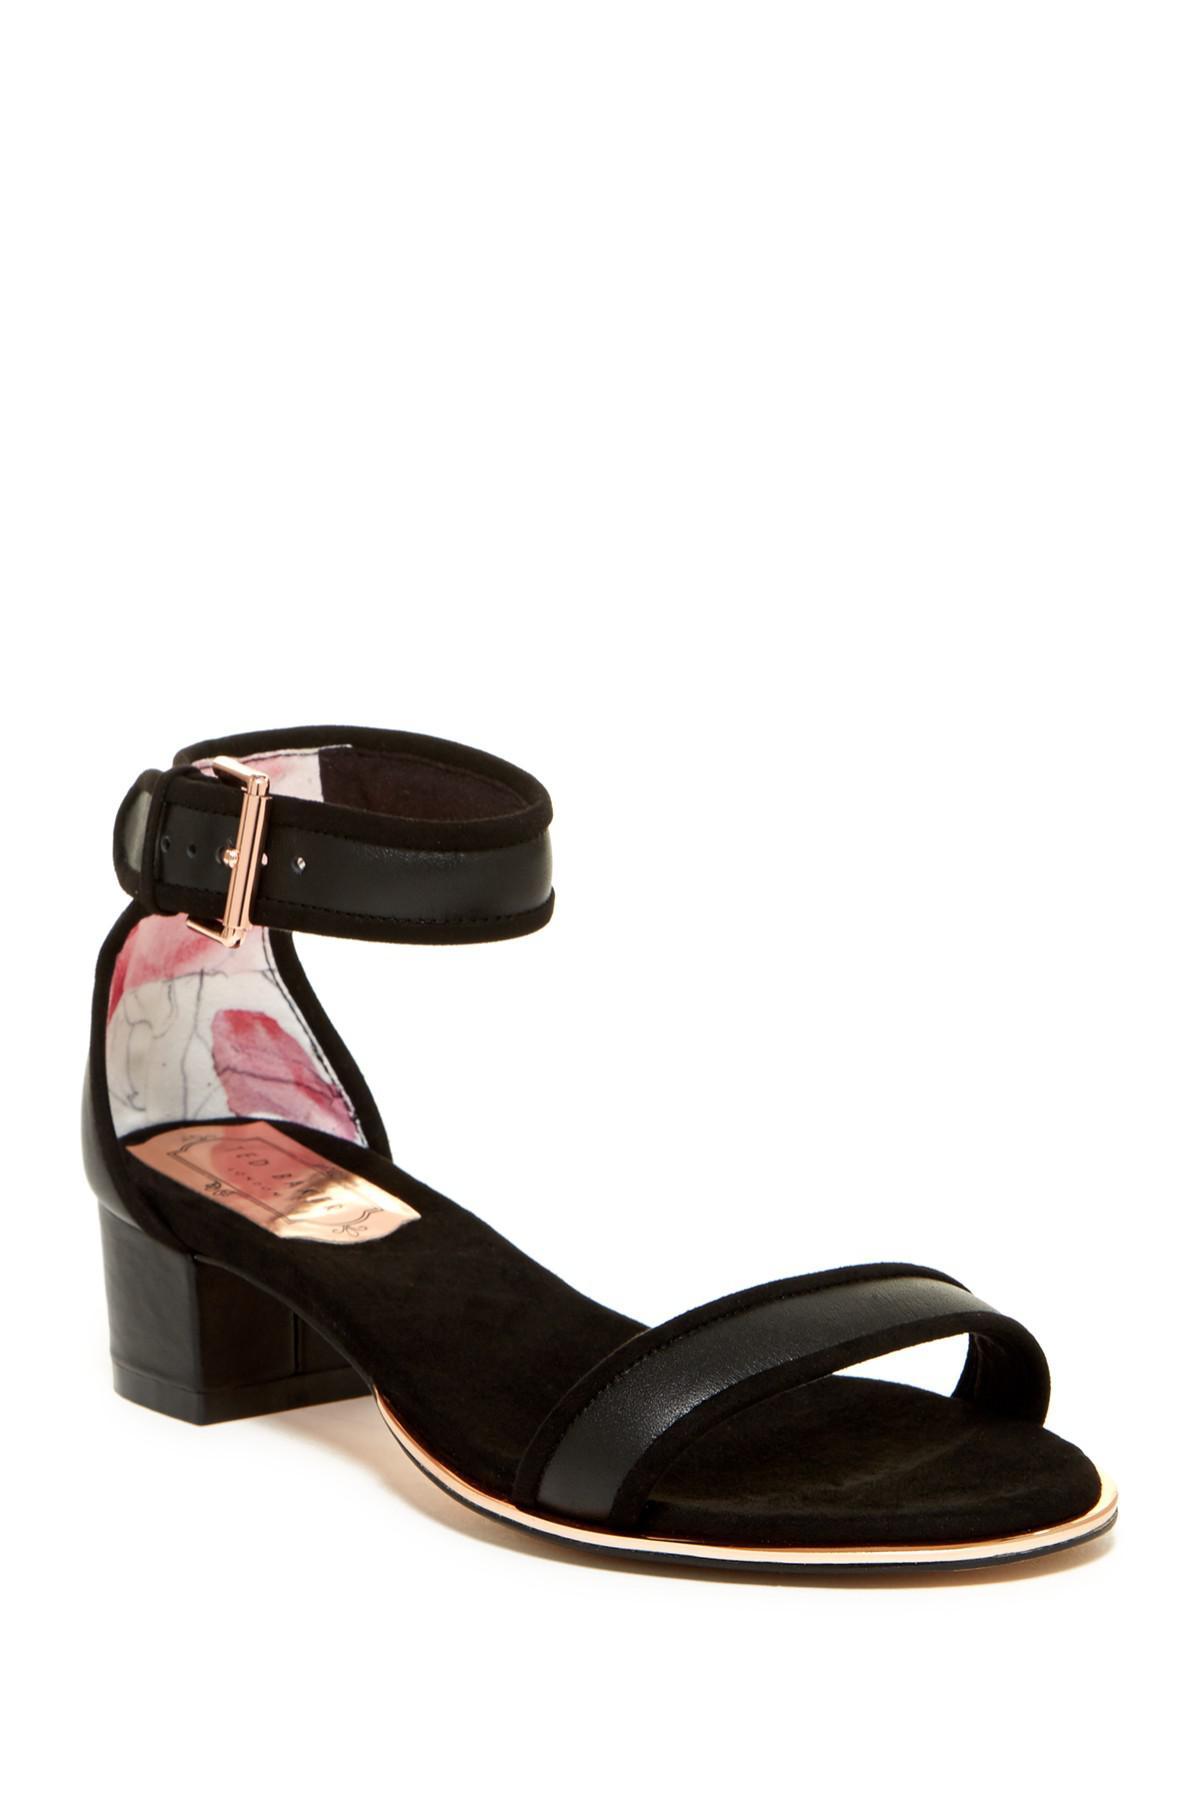 a63efdf5b46e0 Lyst - Ted Baker Ruz Block Heel Sandal in Black